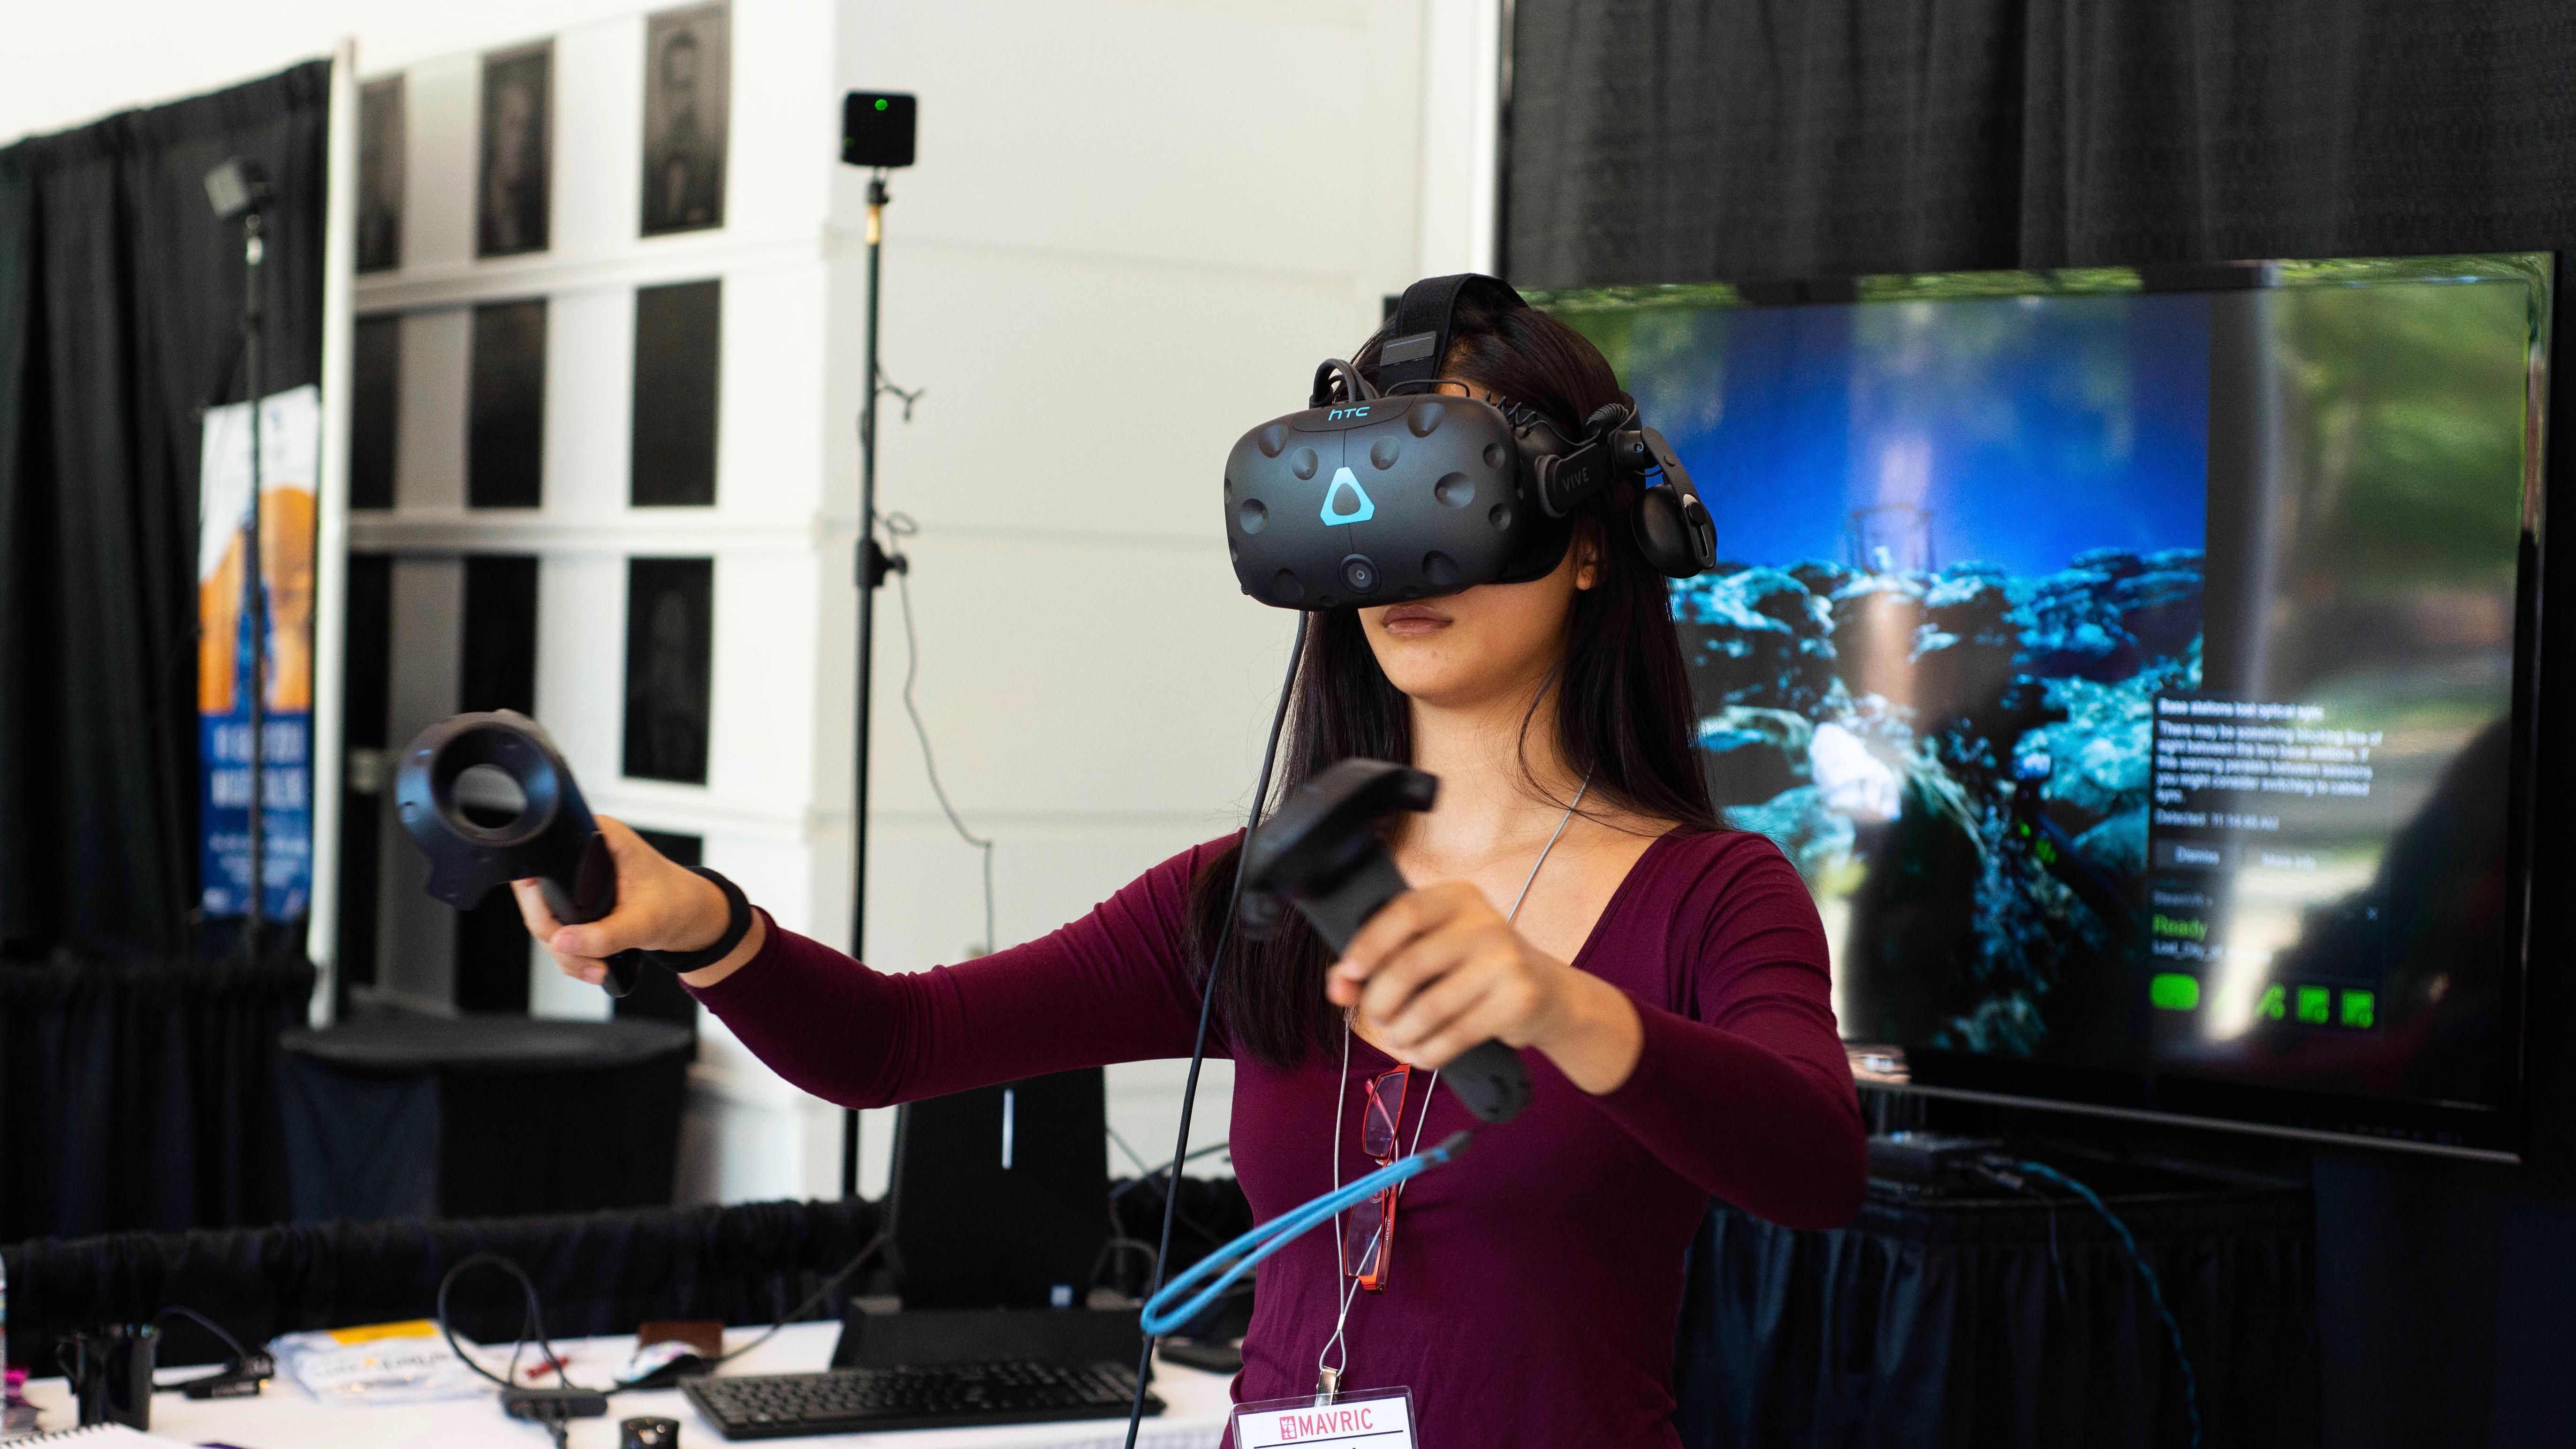 MAVRIC 2018 VR demo